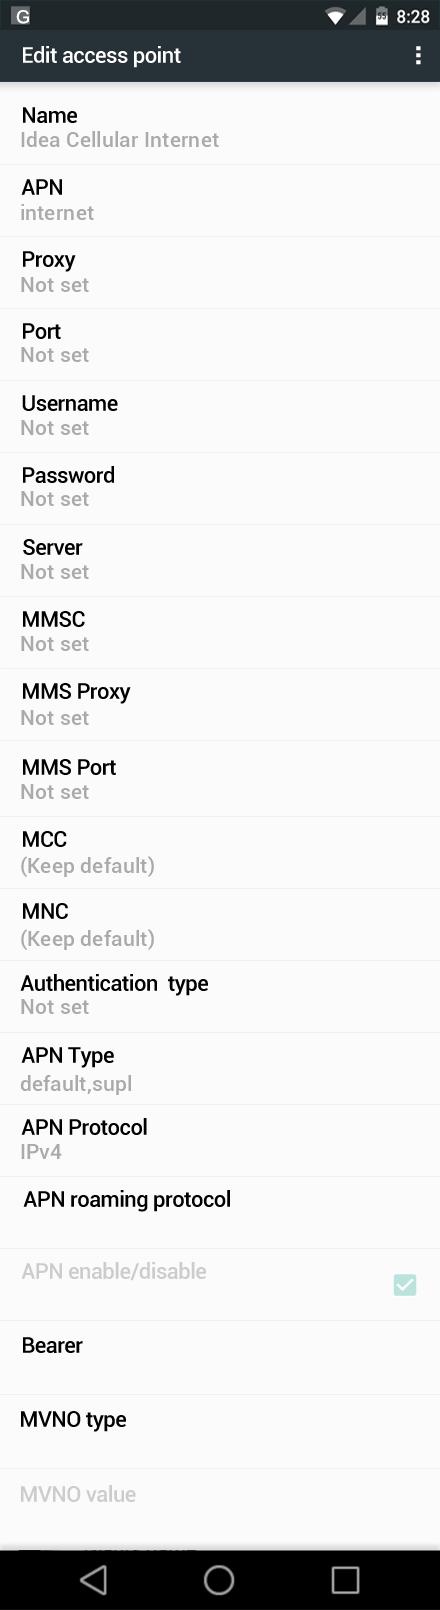 Idea Cellular Internet APN settings for Android Marshmallow screenshot